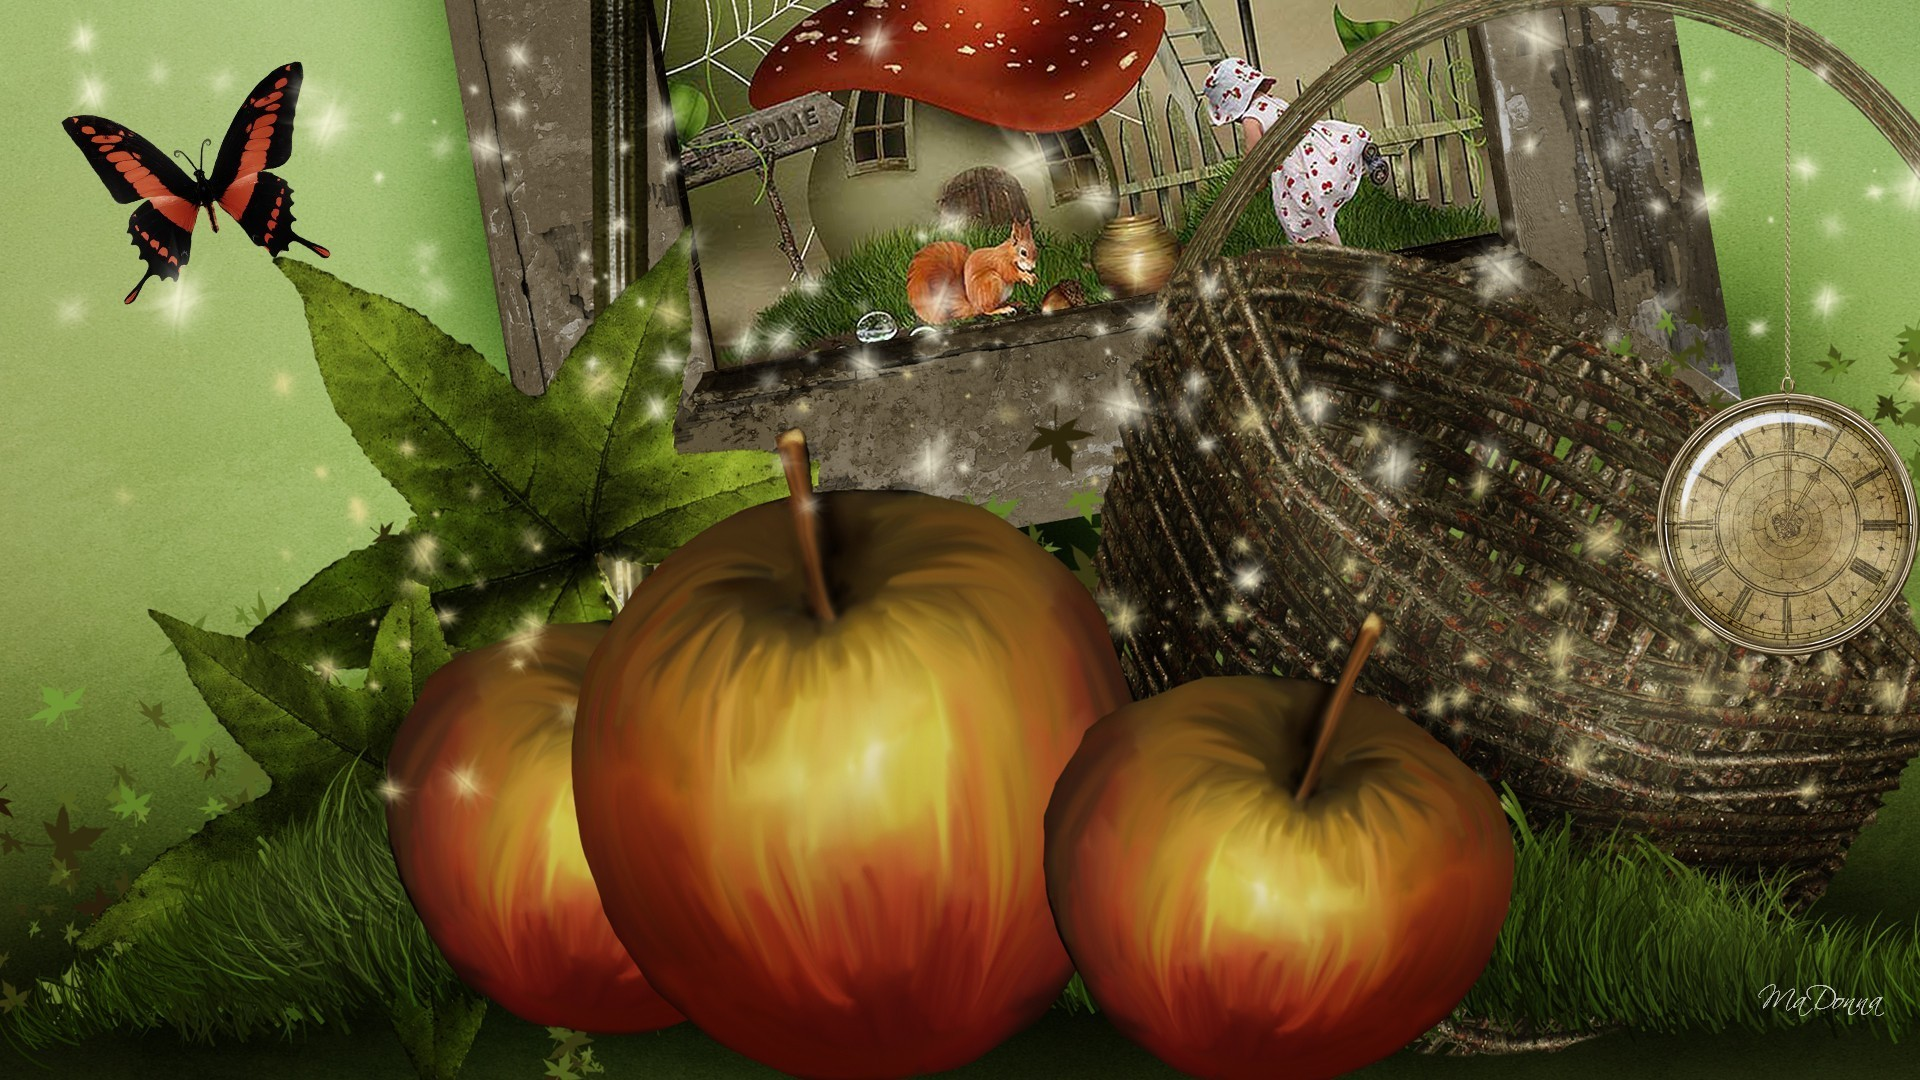 Fall Leaves Iphone 7 Wallpaper Pumpkin Desktop Wallpaper 183 ①